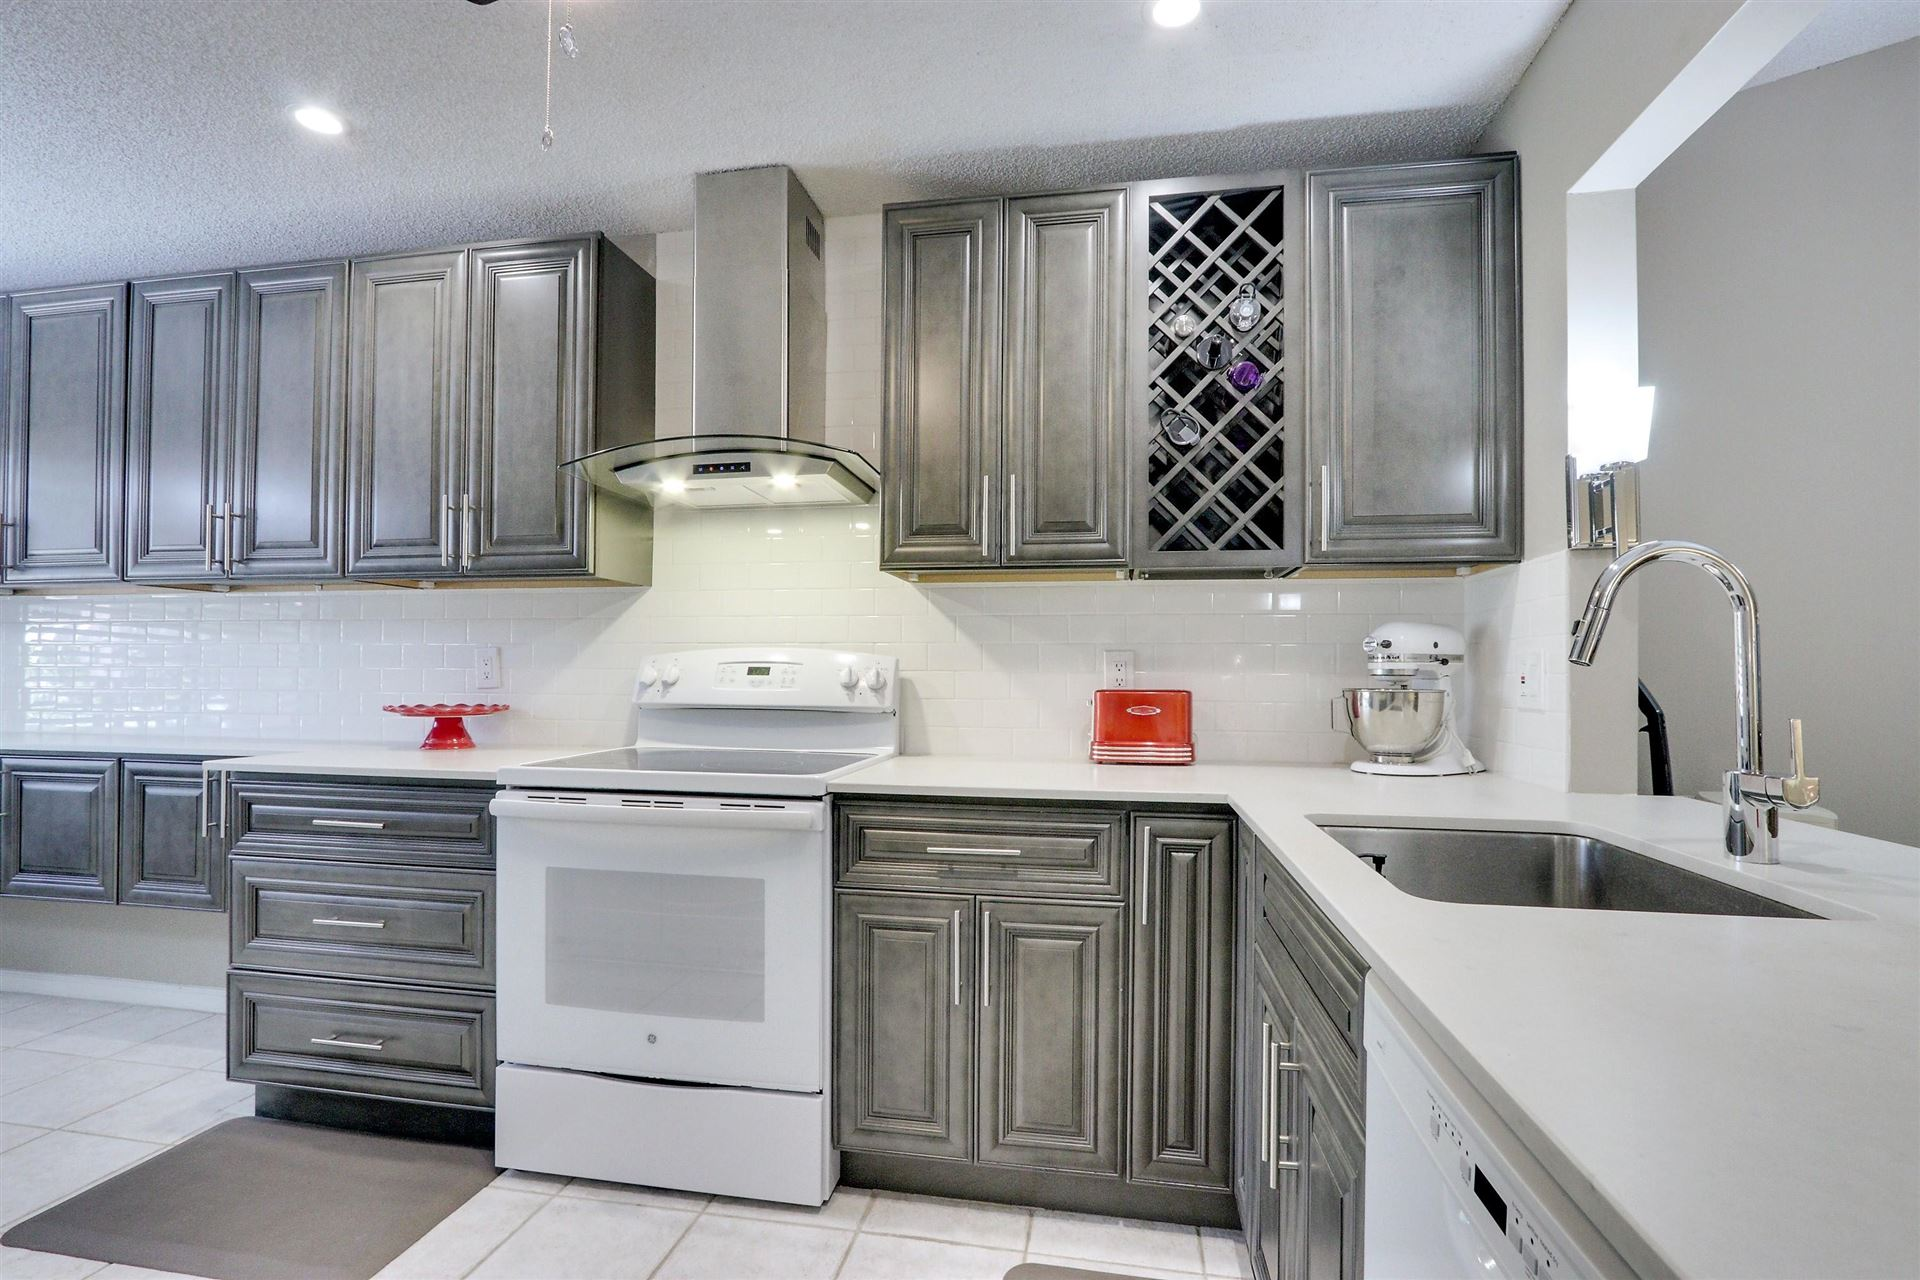 10082 Shadywood Place, Boynton Beach, FL 33437 - #: RX-10677471